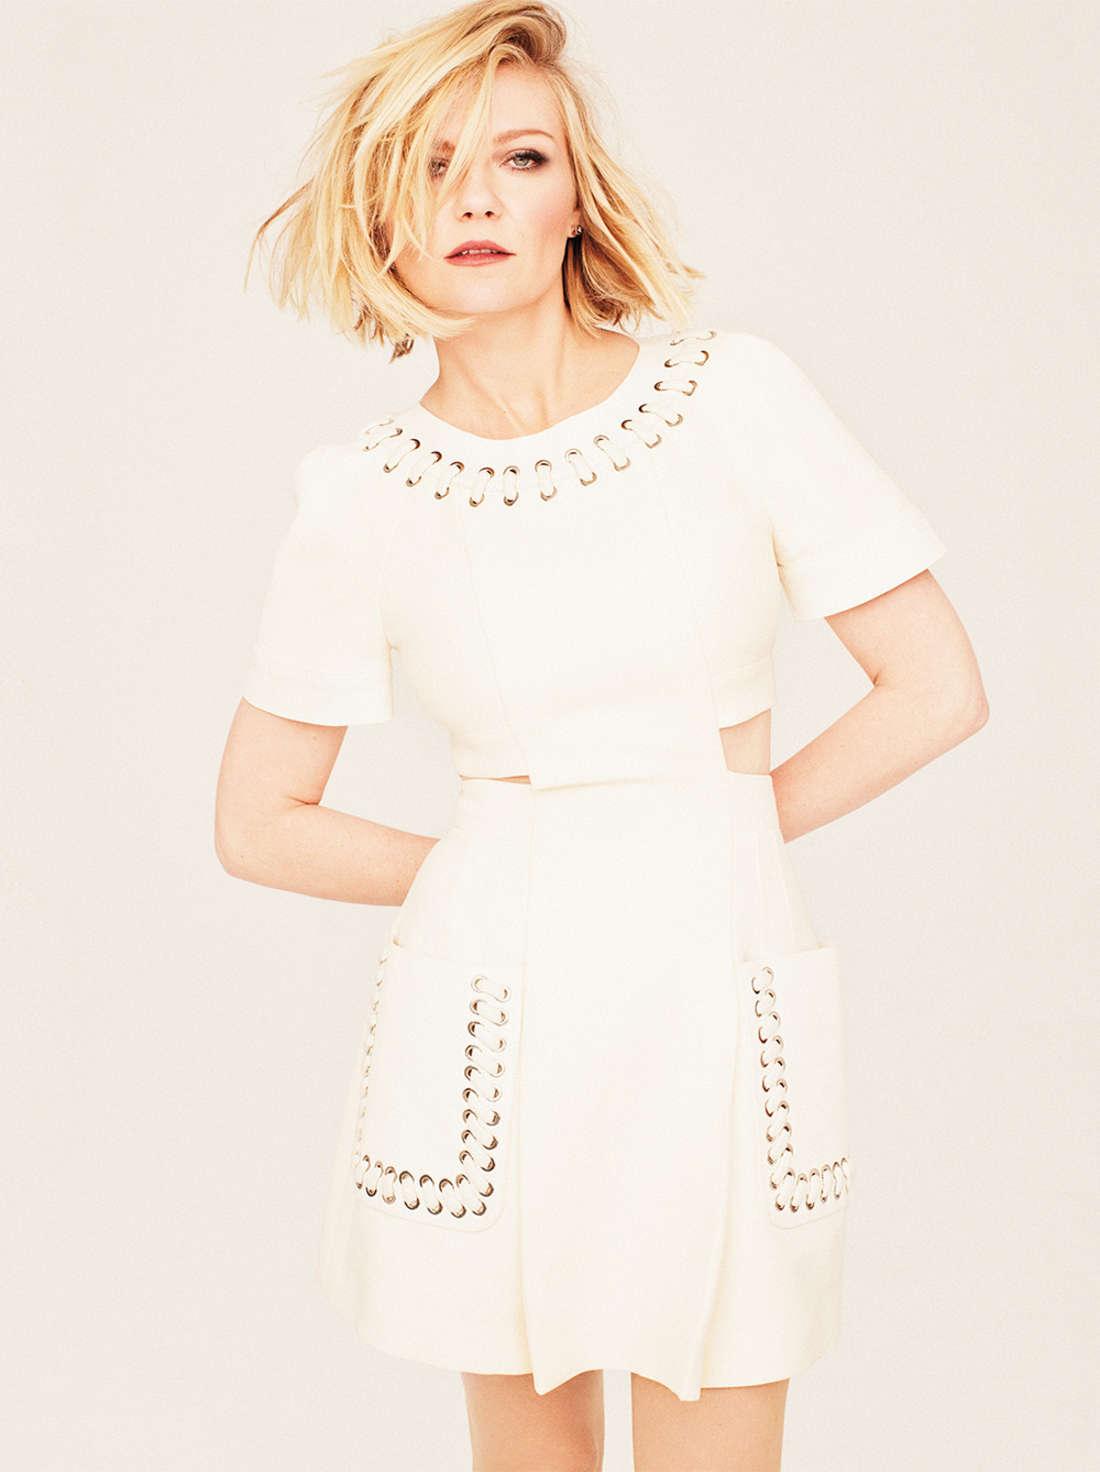 Kirsten Dunst – California Style Photoshoot (March 2016 ...